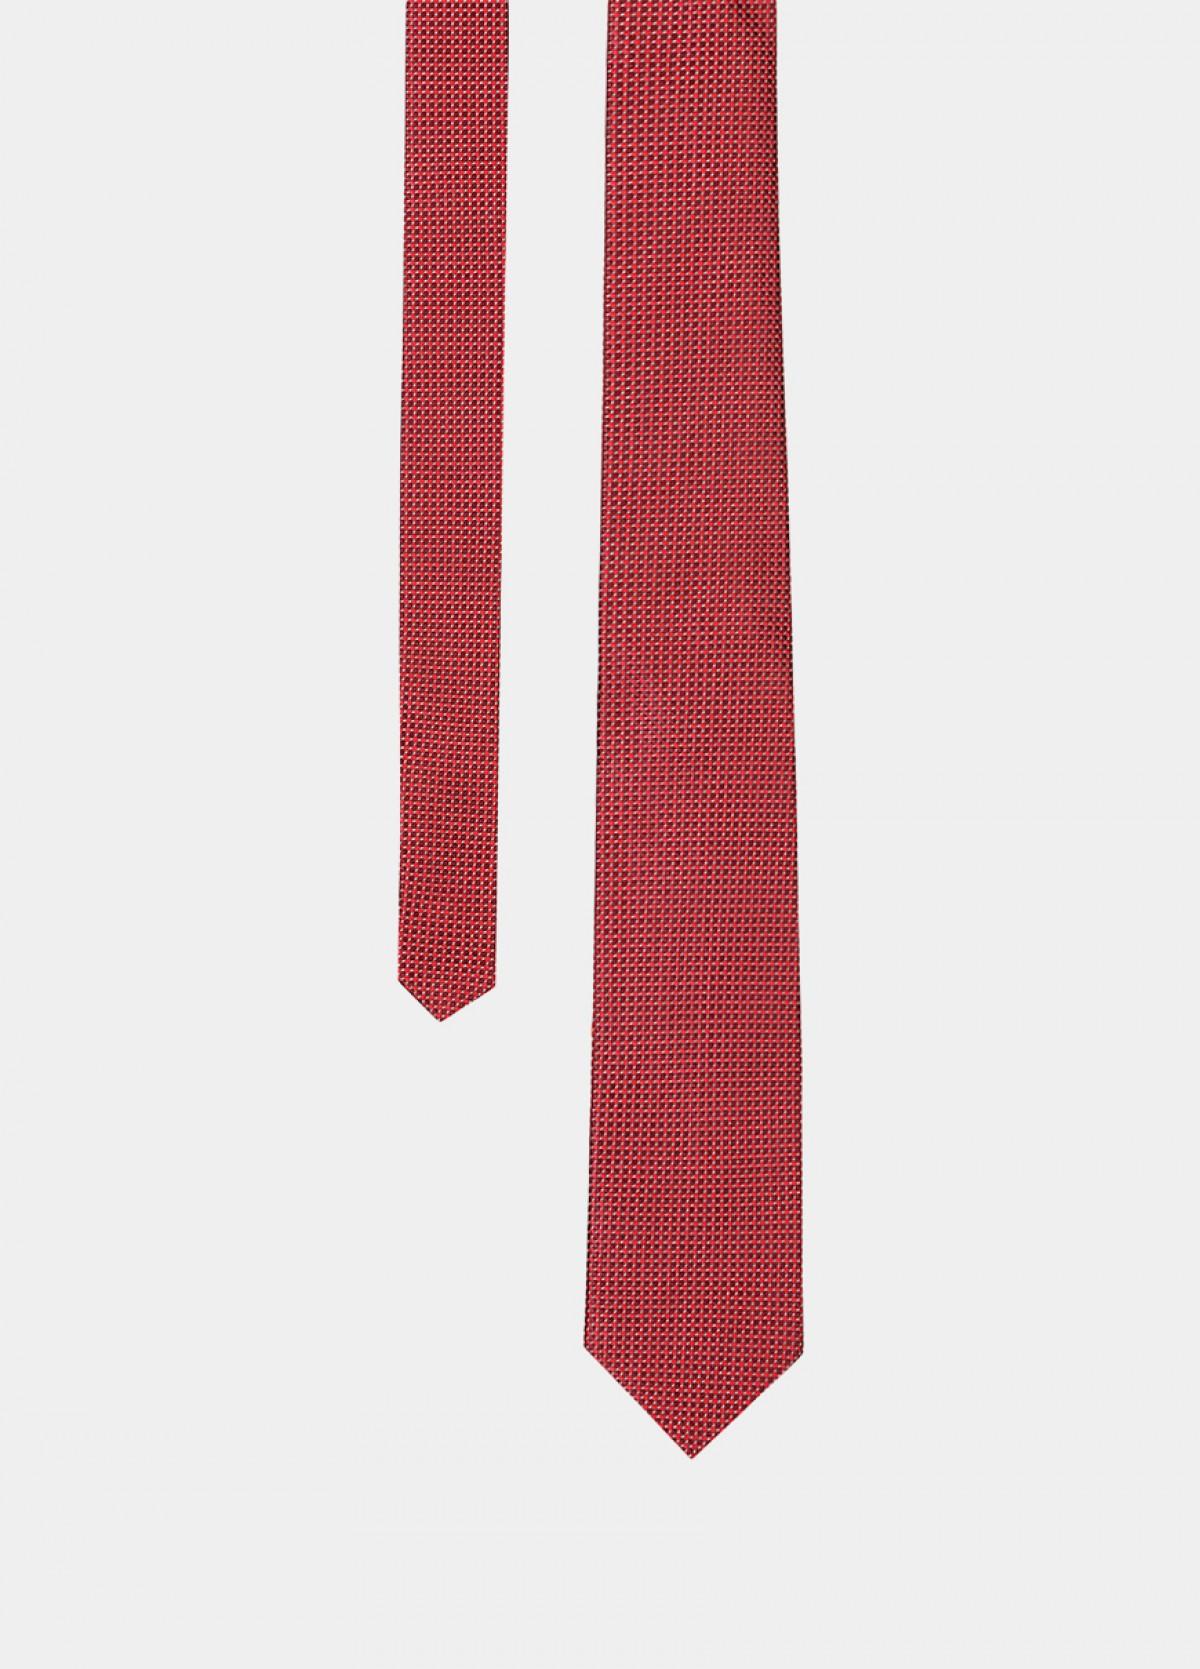 The Red Maroon Silk Tie